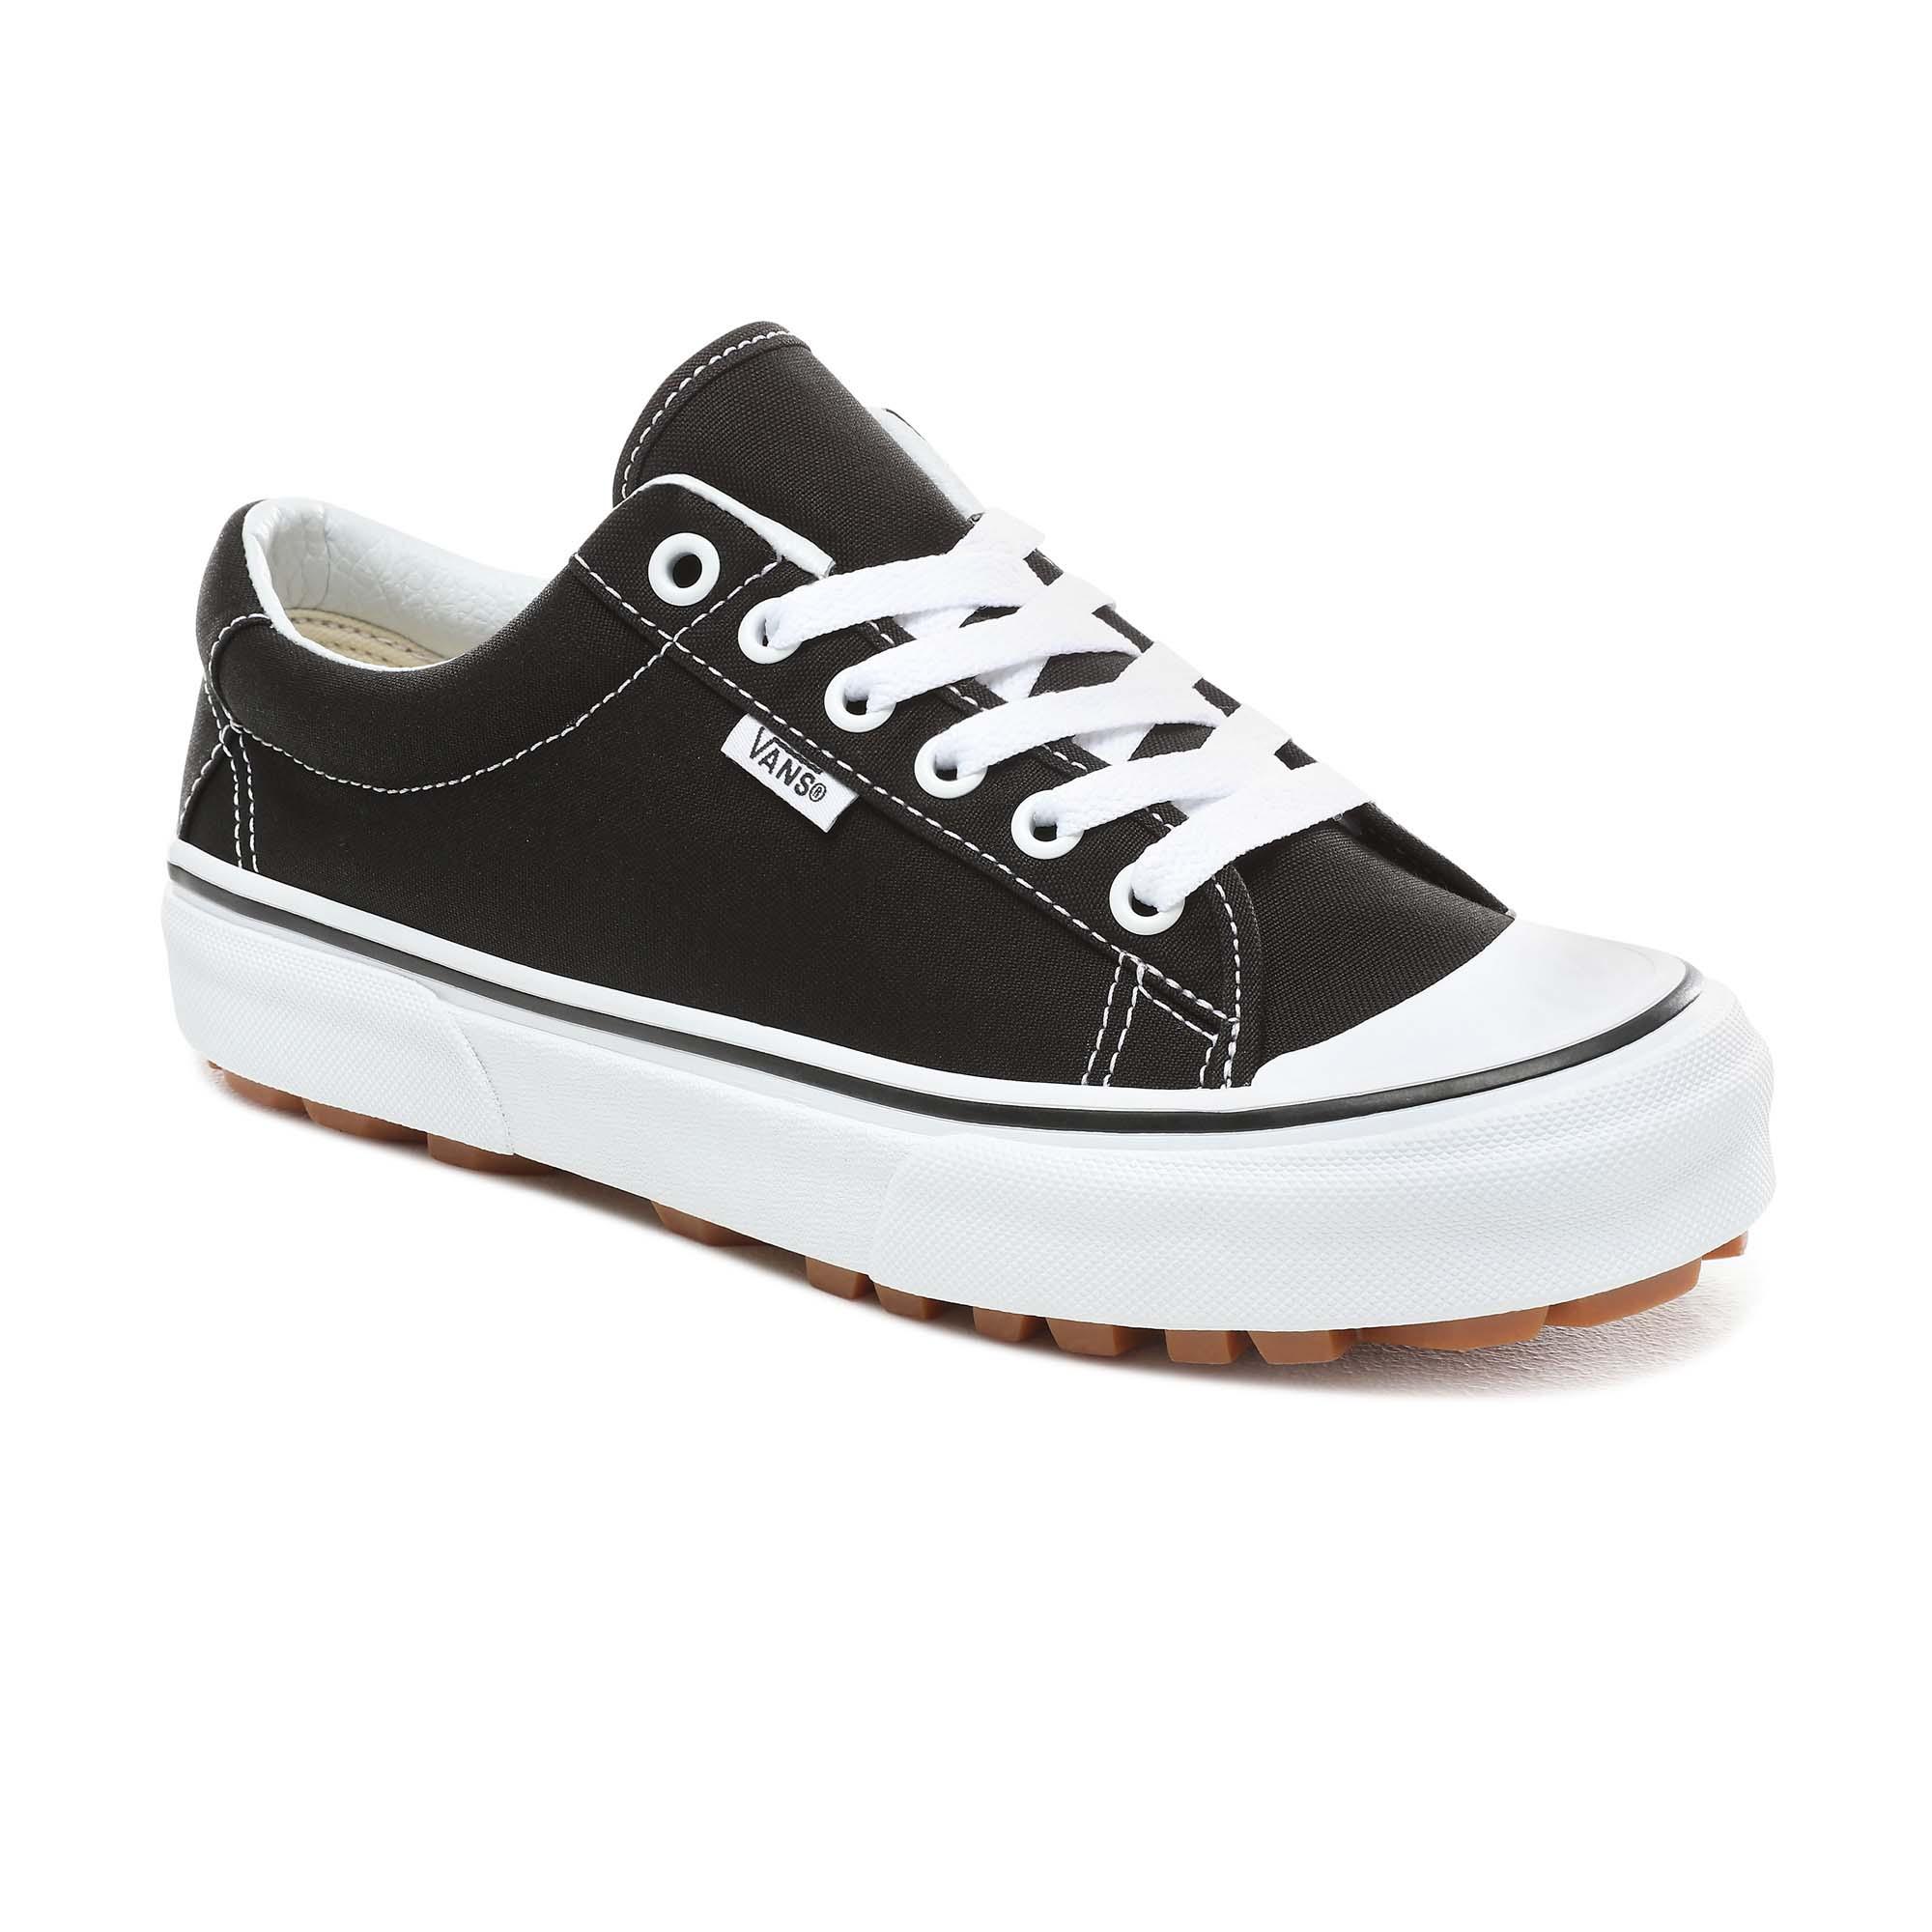 Vans Ua Style 29 Black/True White